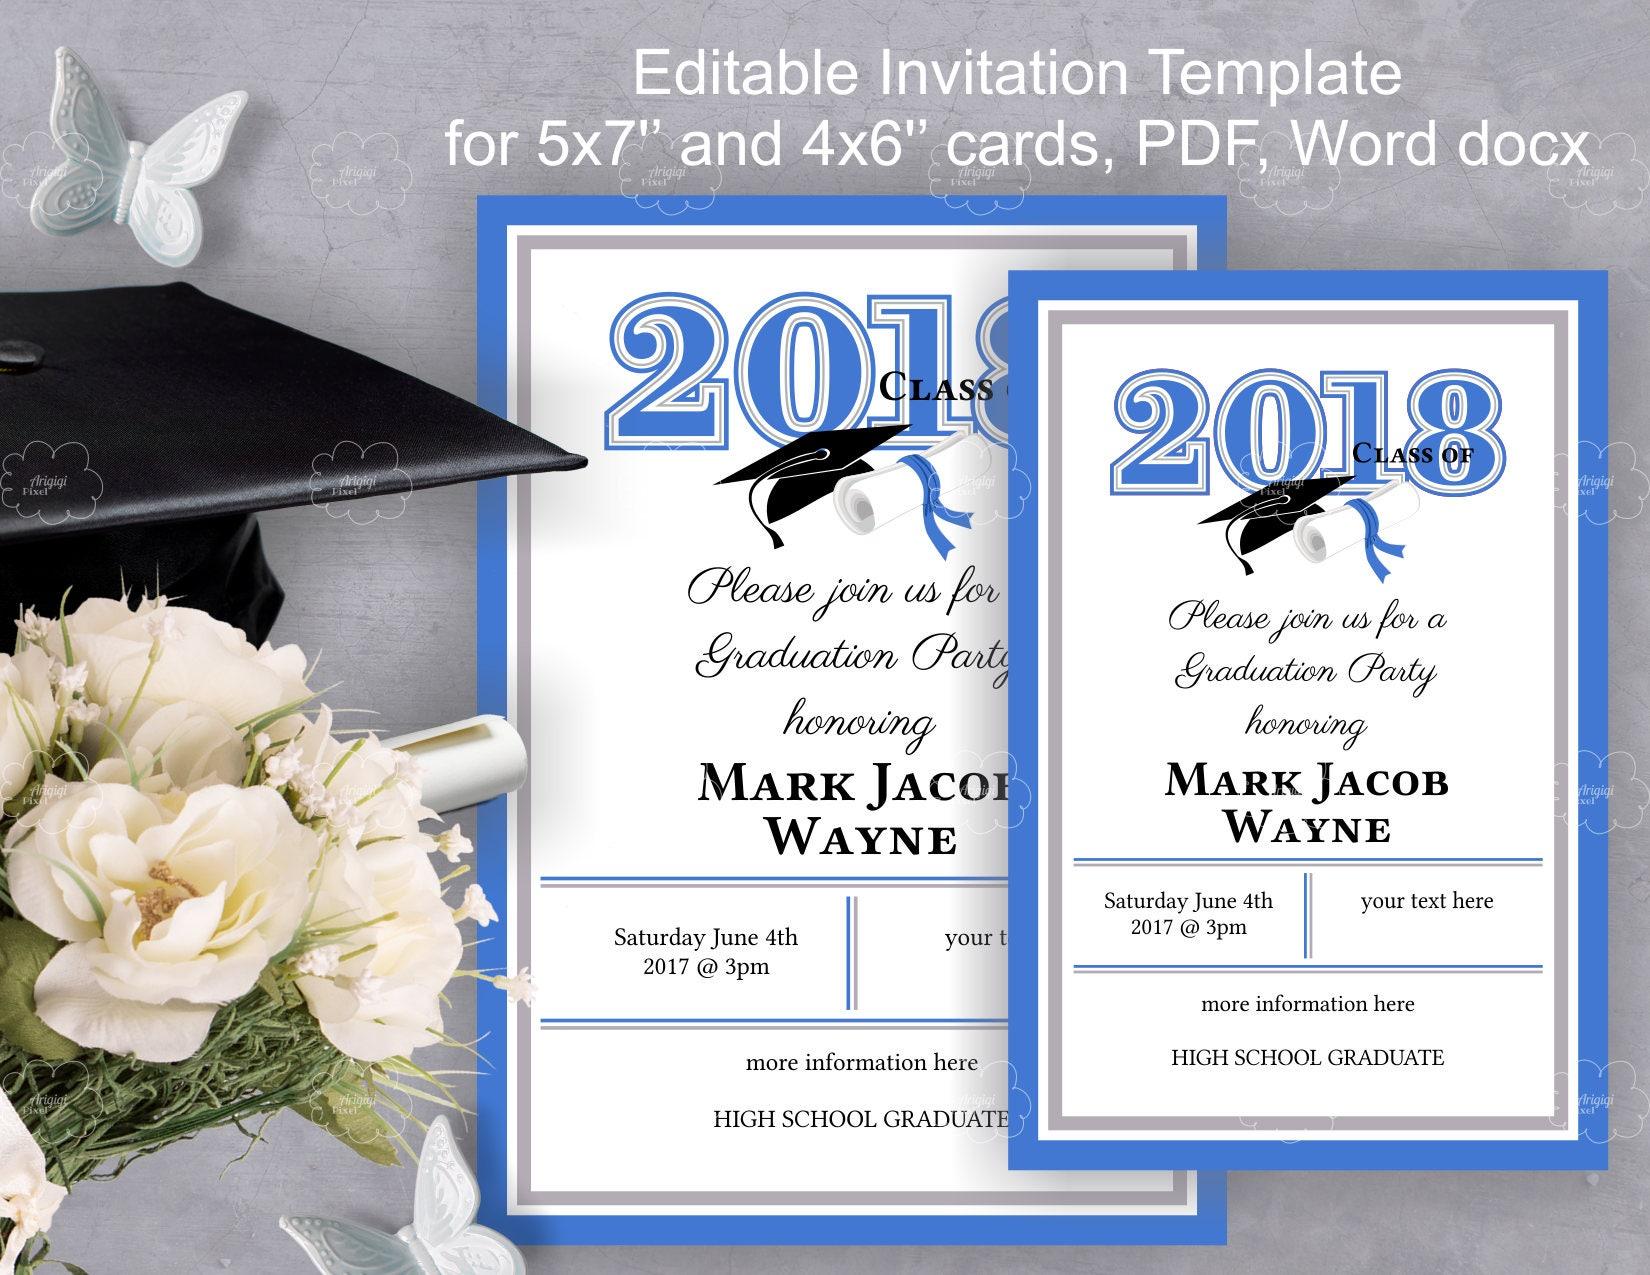 Grade Party Invitation Template DIY invitation edit yourself